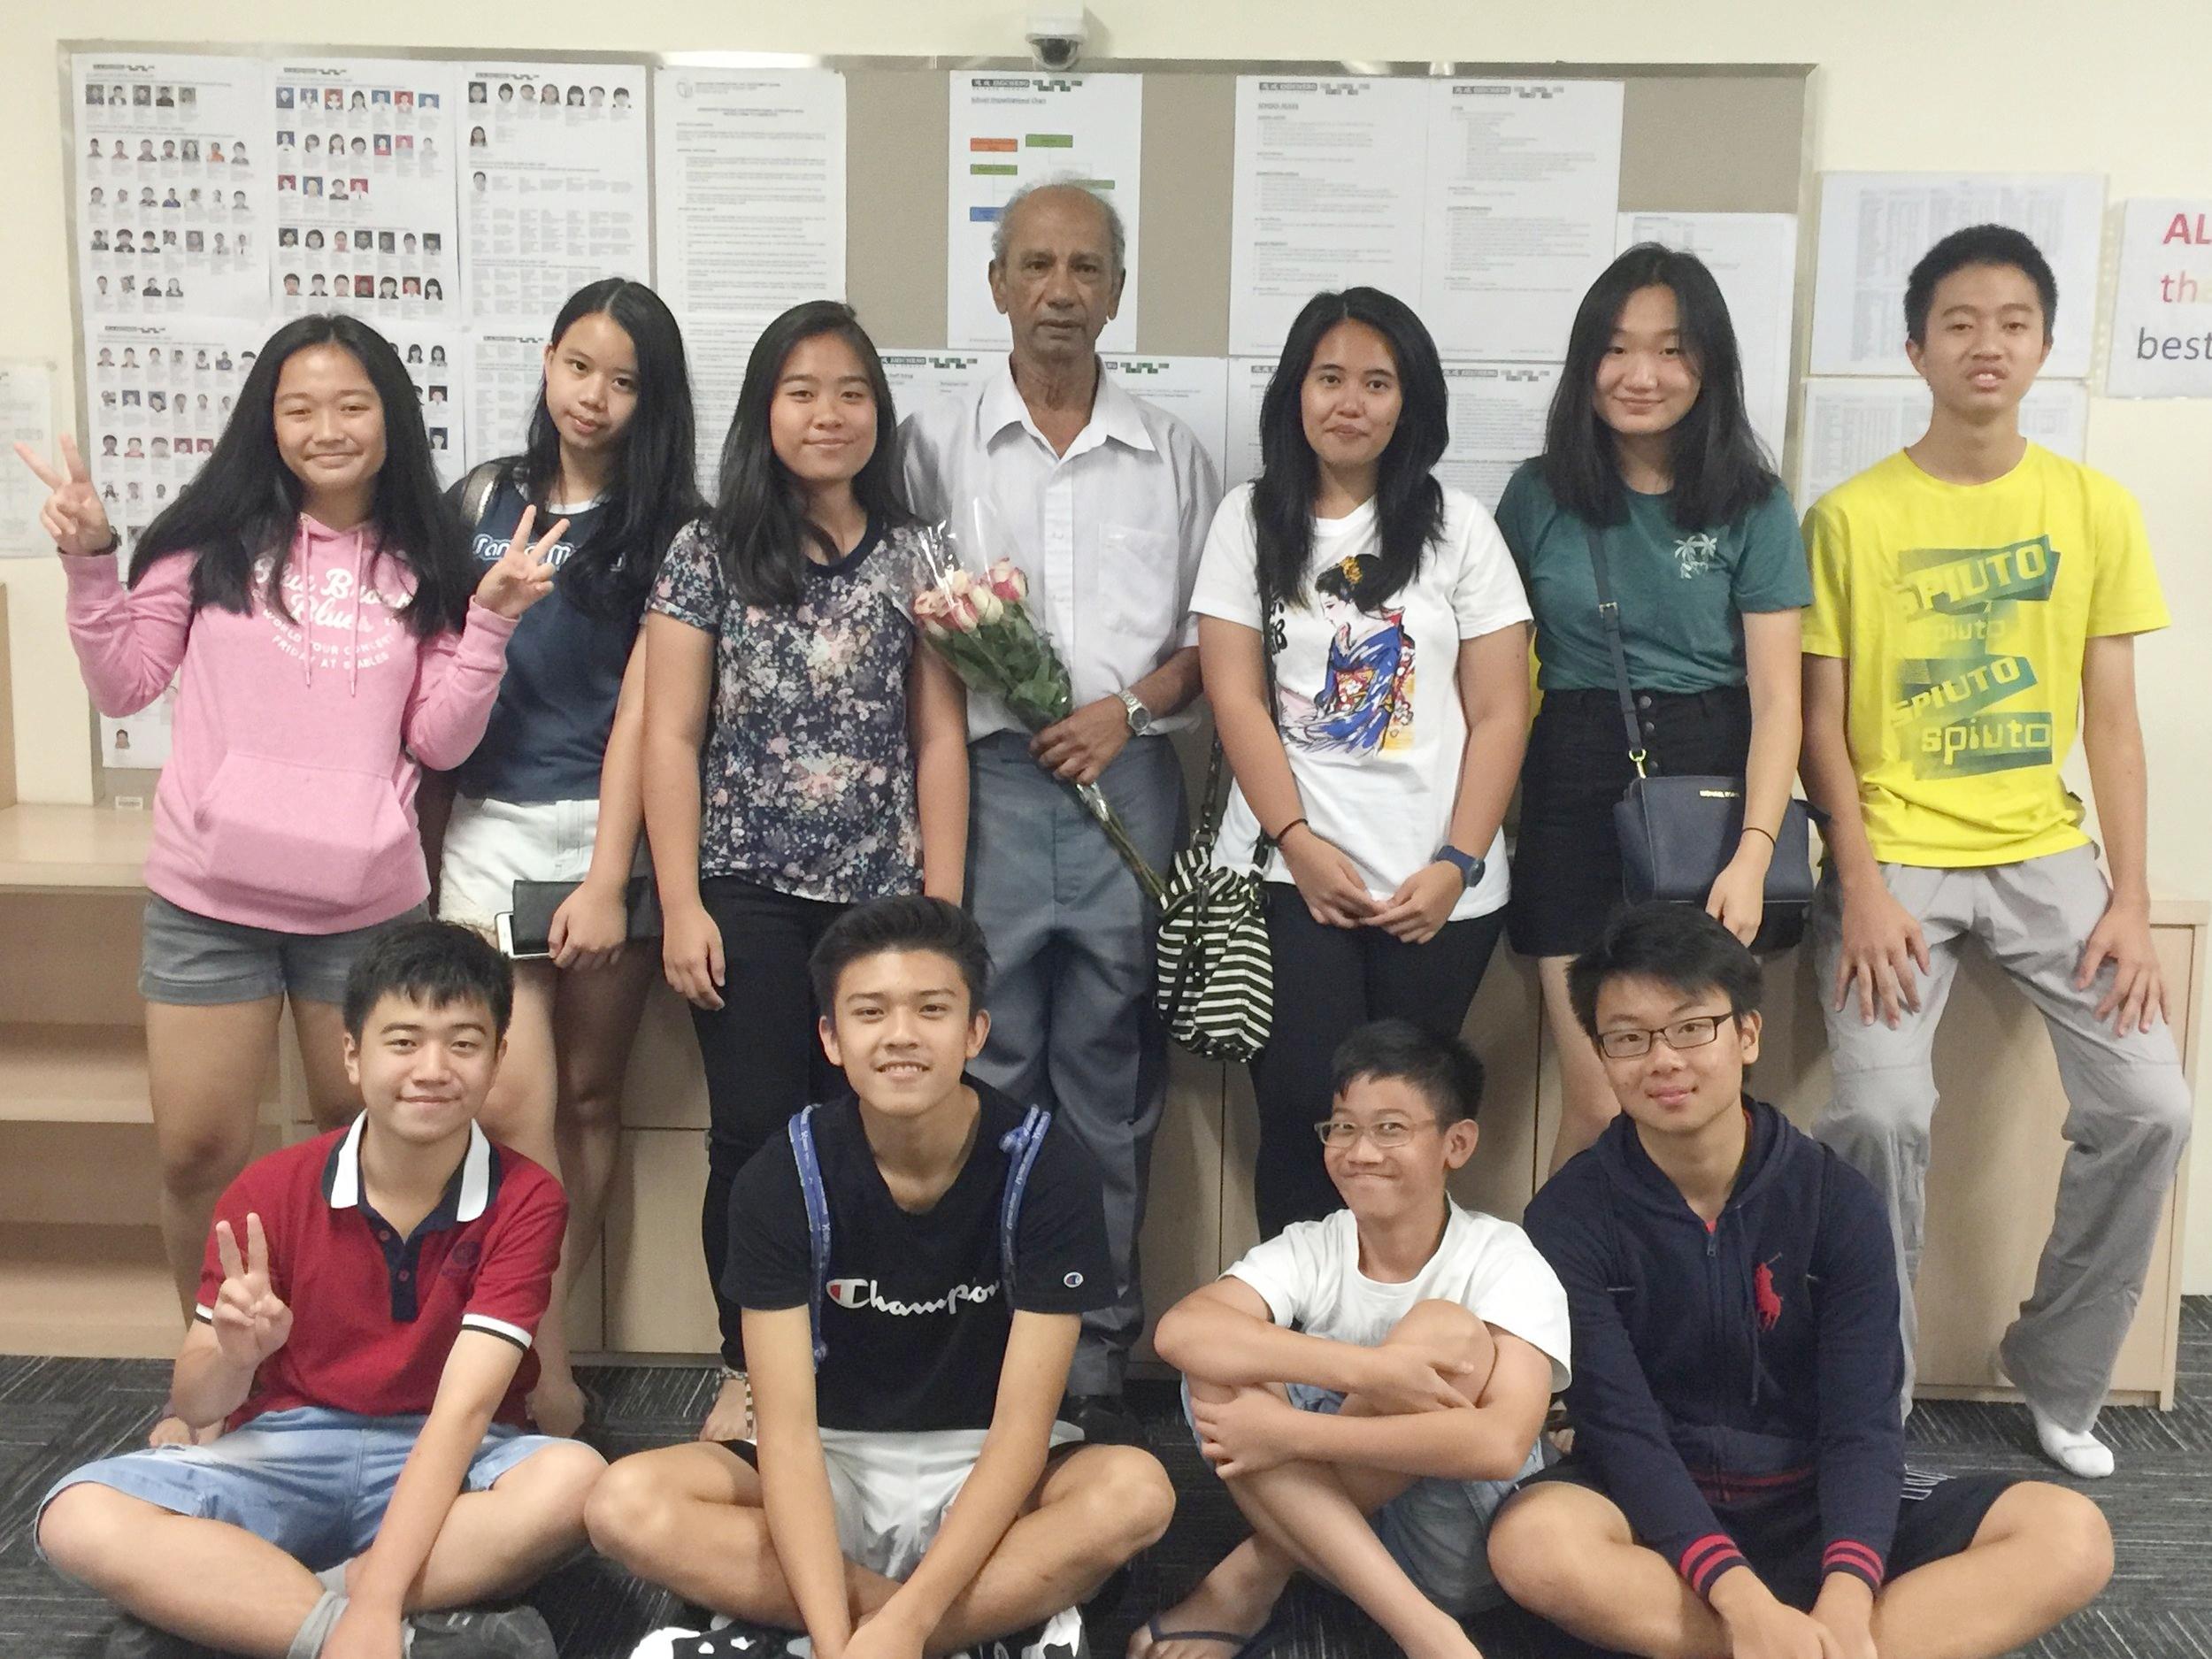 teachers' day_ 2 Sep 2016 (4).JPG